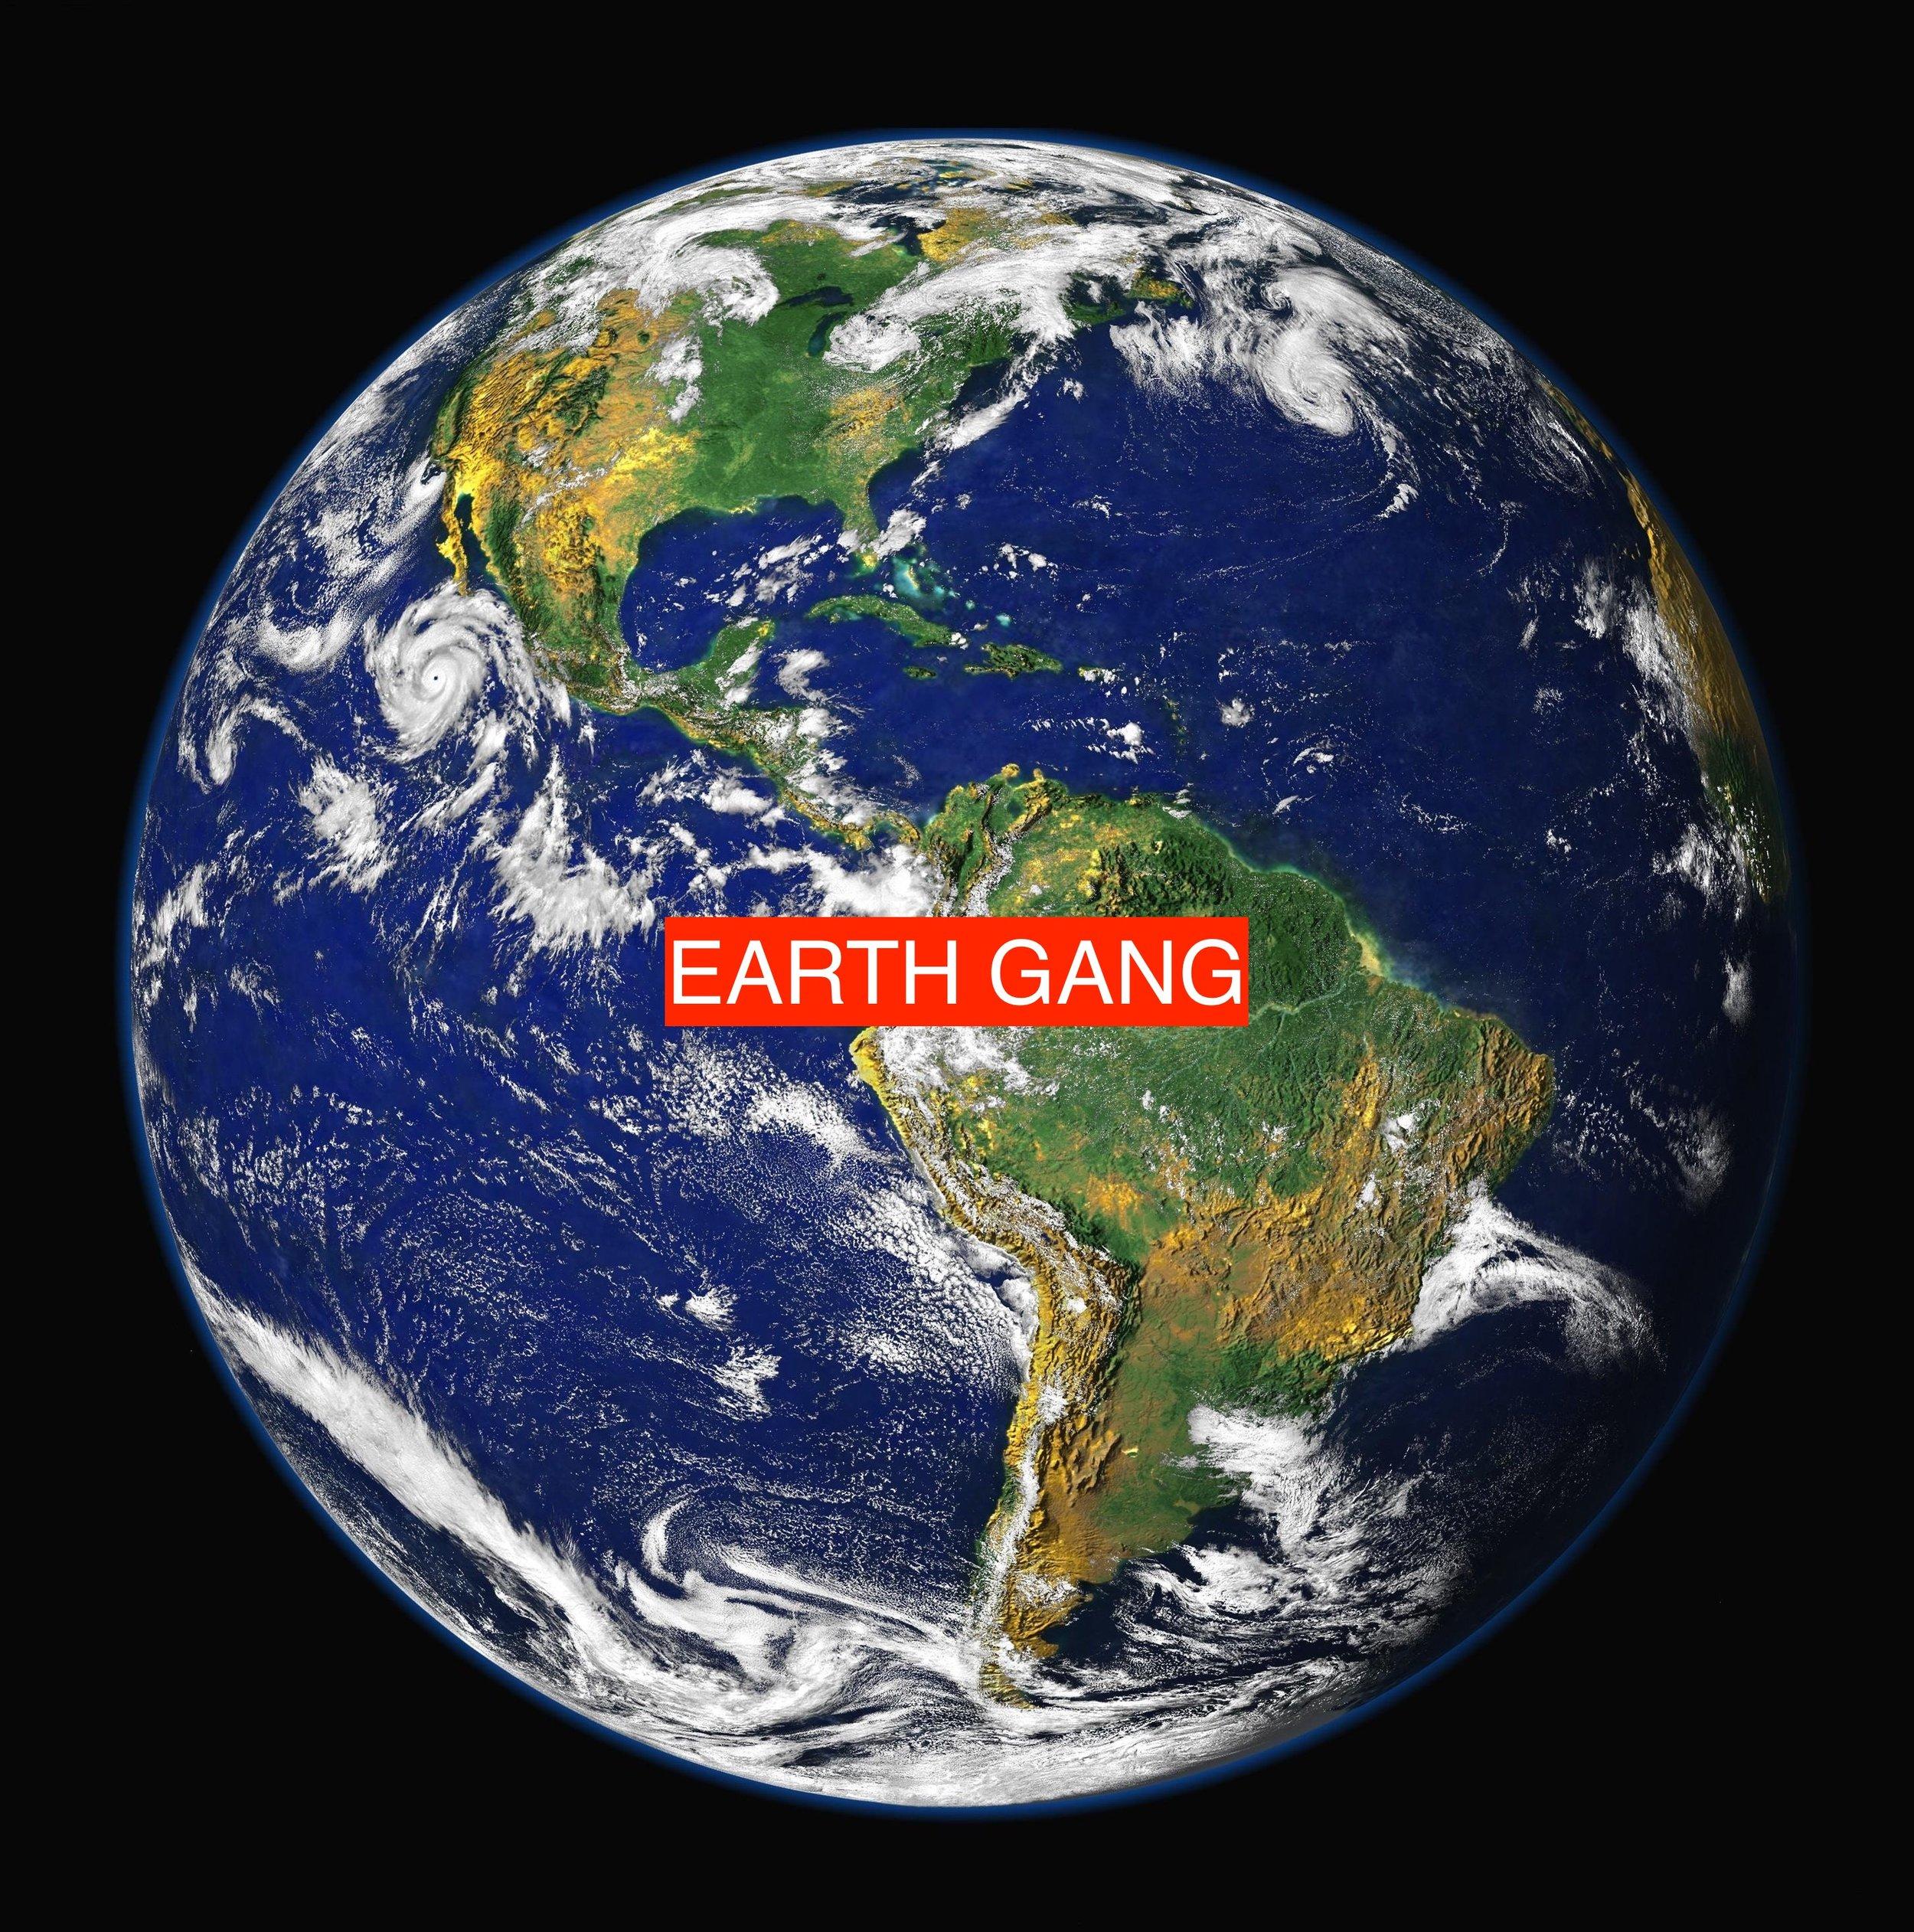 earth-galaxy-universe-2422.jpg